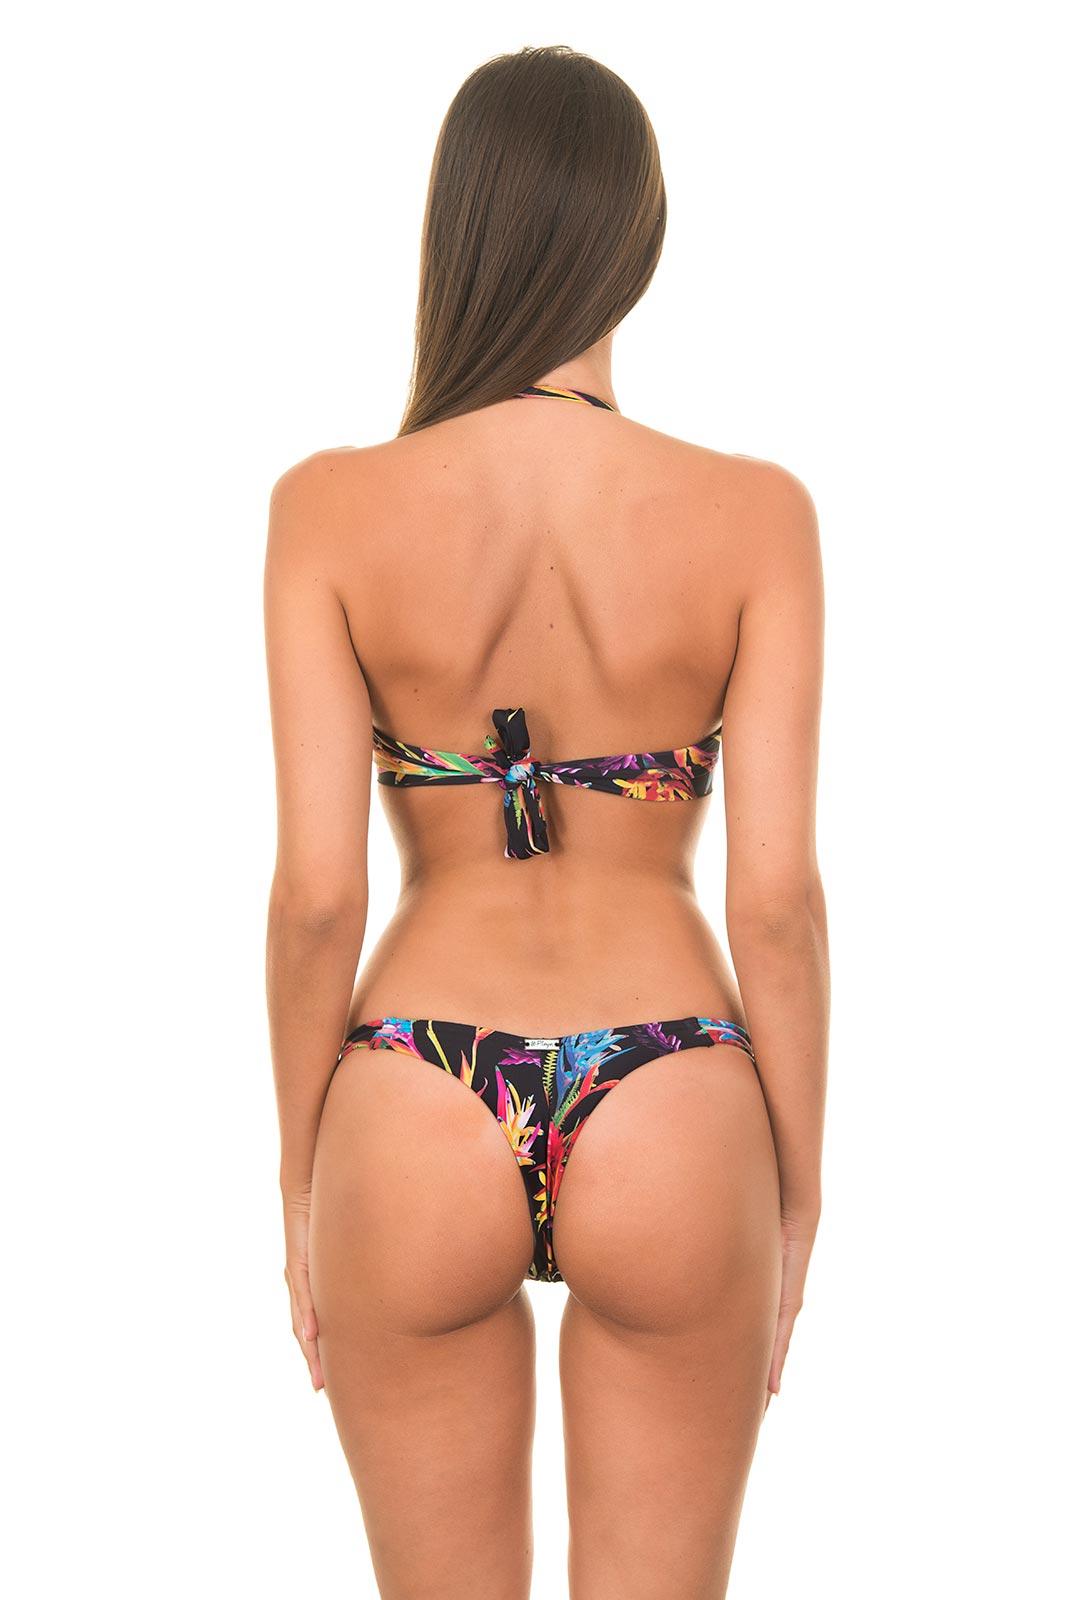 Czech bikini models